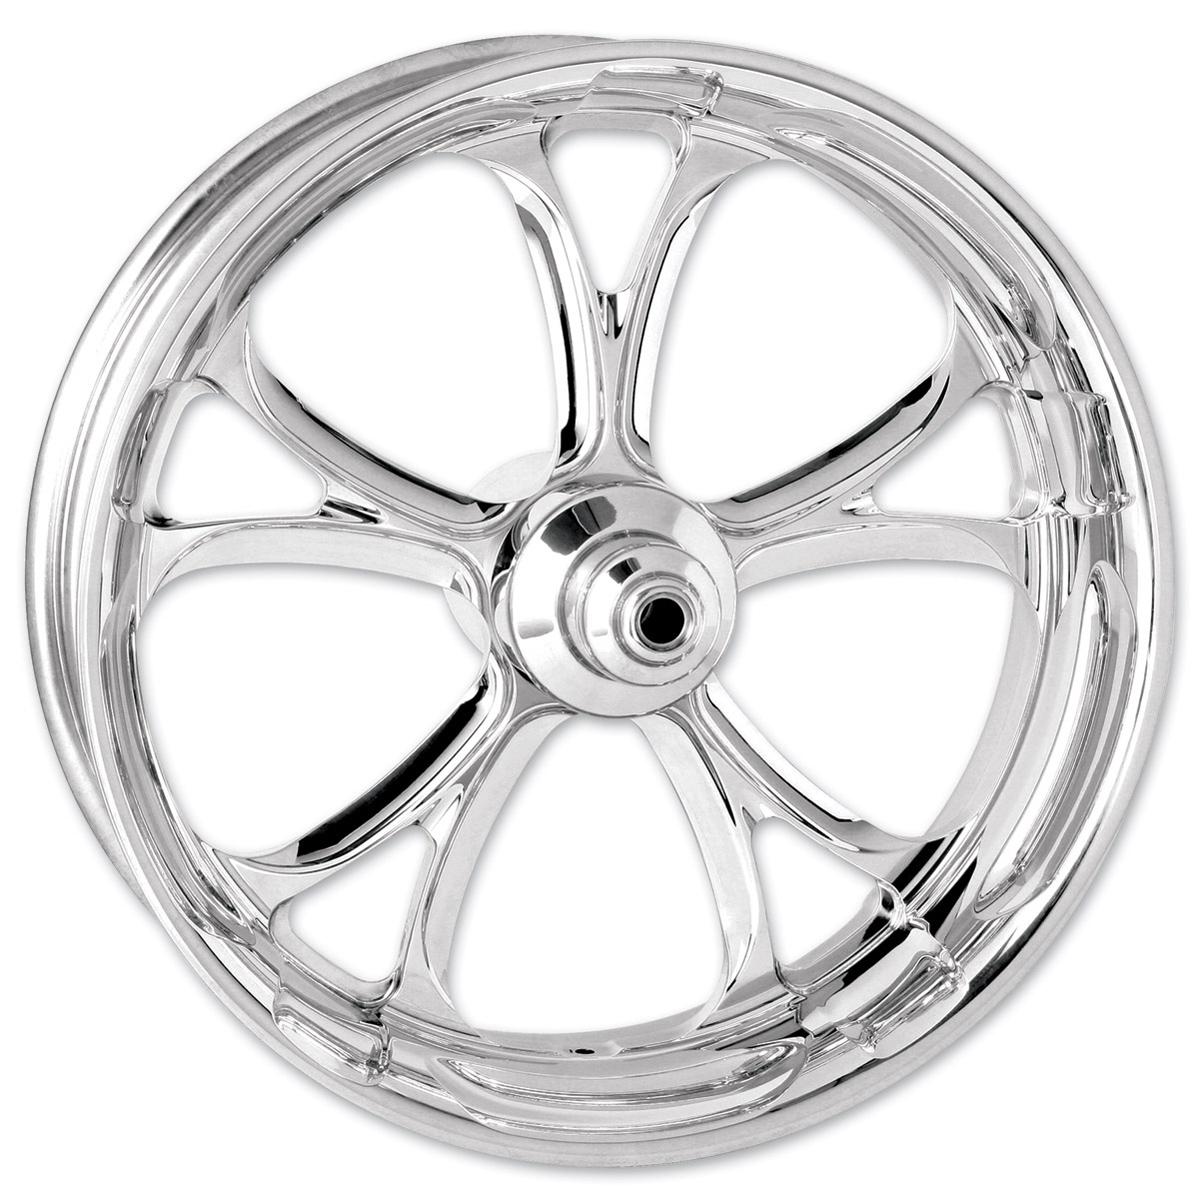 Performance Machine Luxe Chrome Rear Wheel 18x5.5